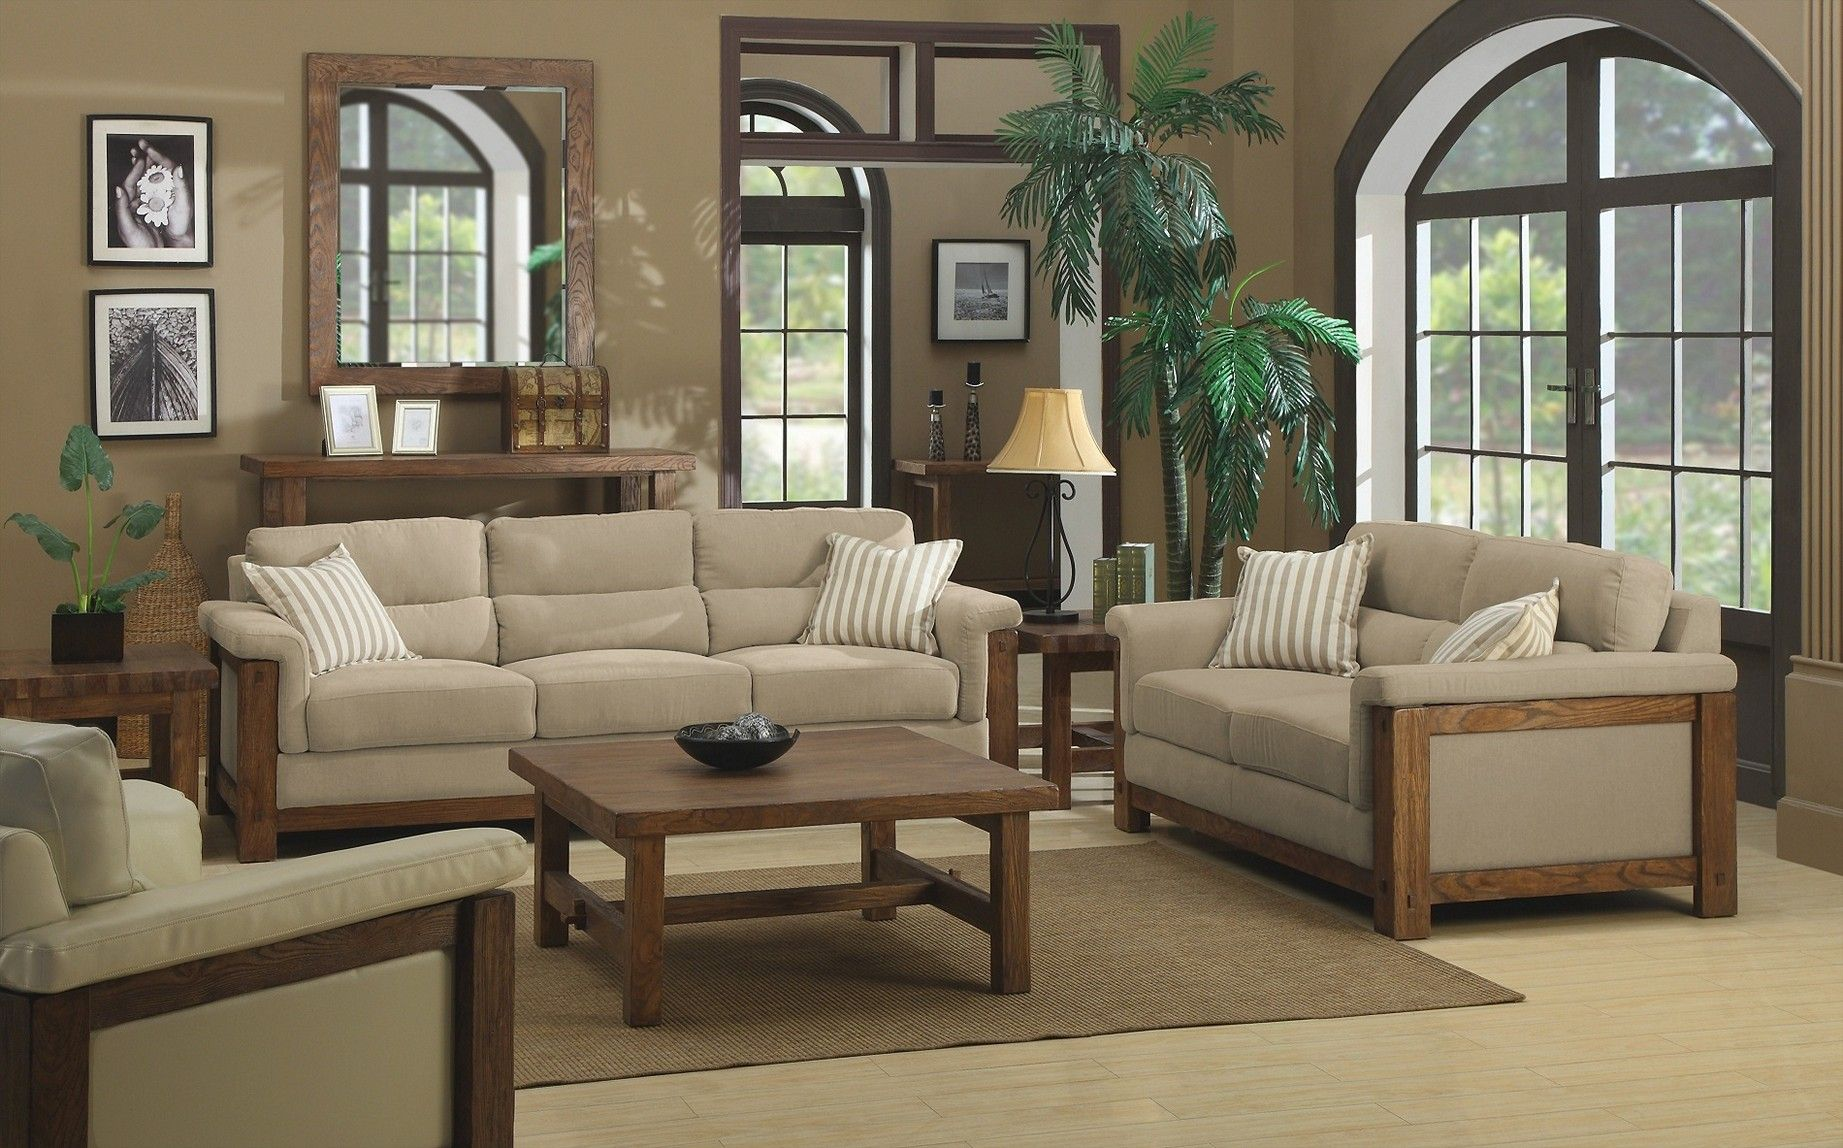 rustic living room furniture. Rustic Oak Living Room Furniture  Home comfort Pinterest